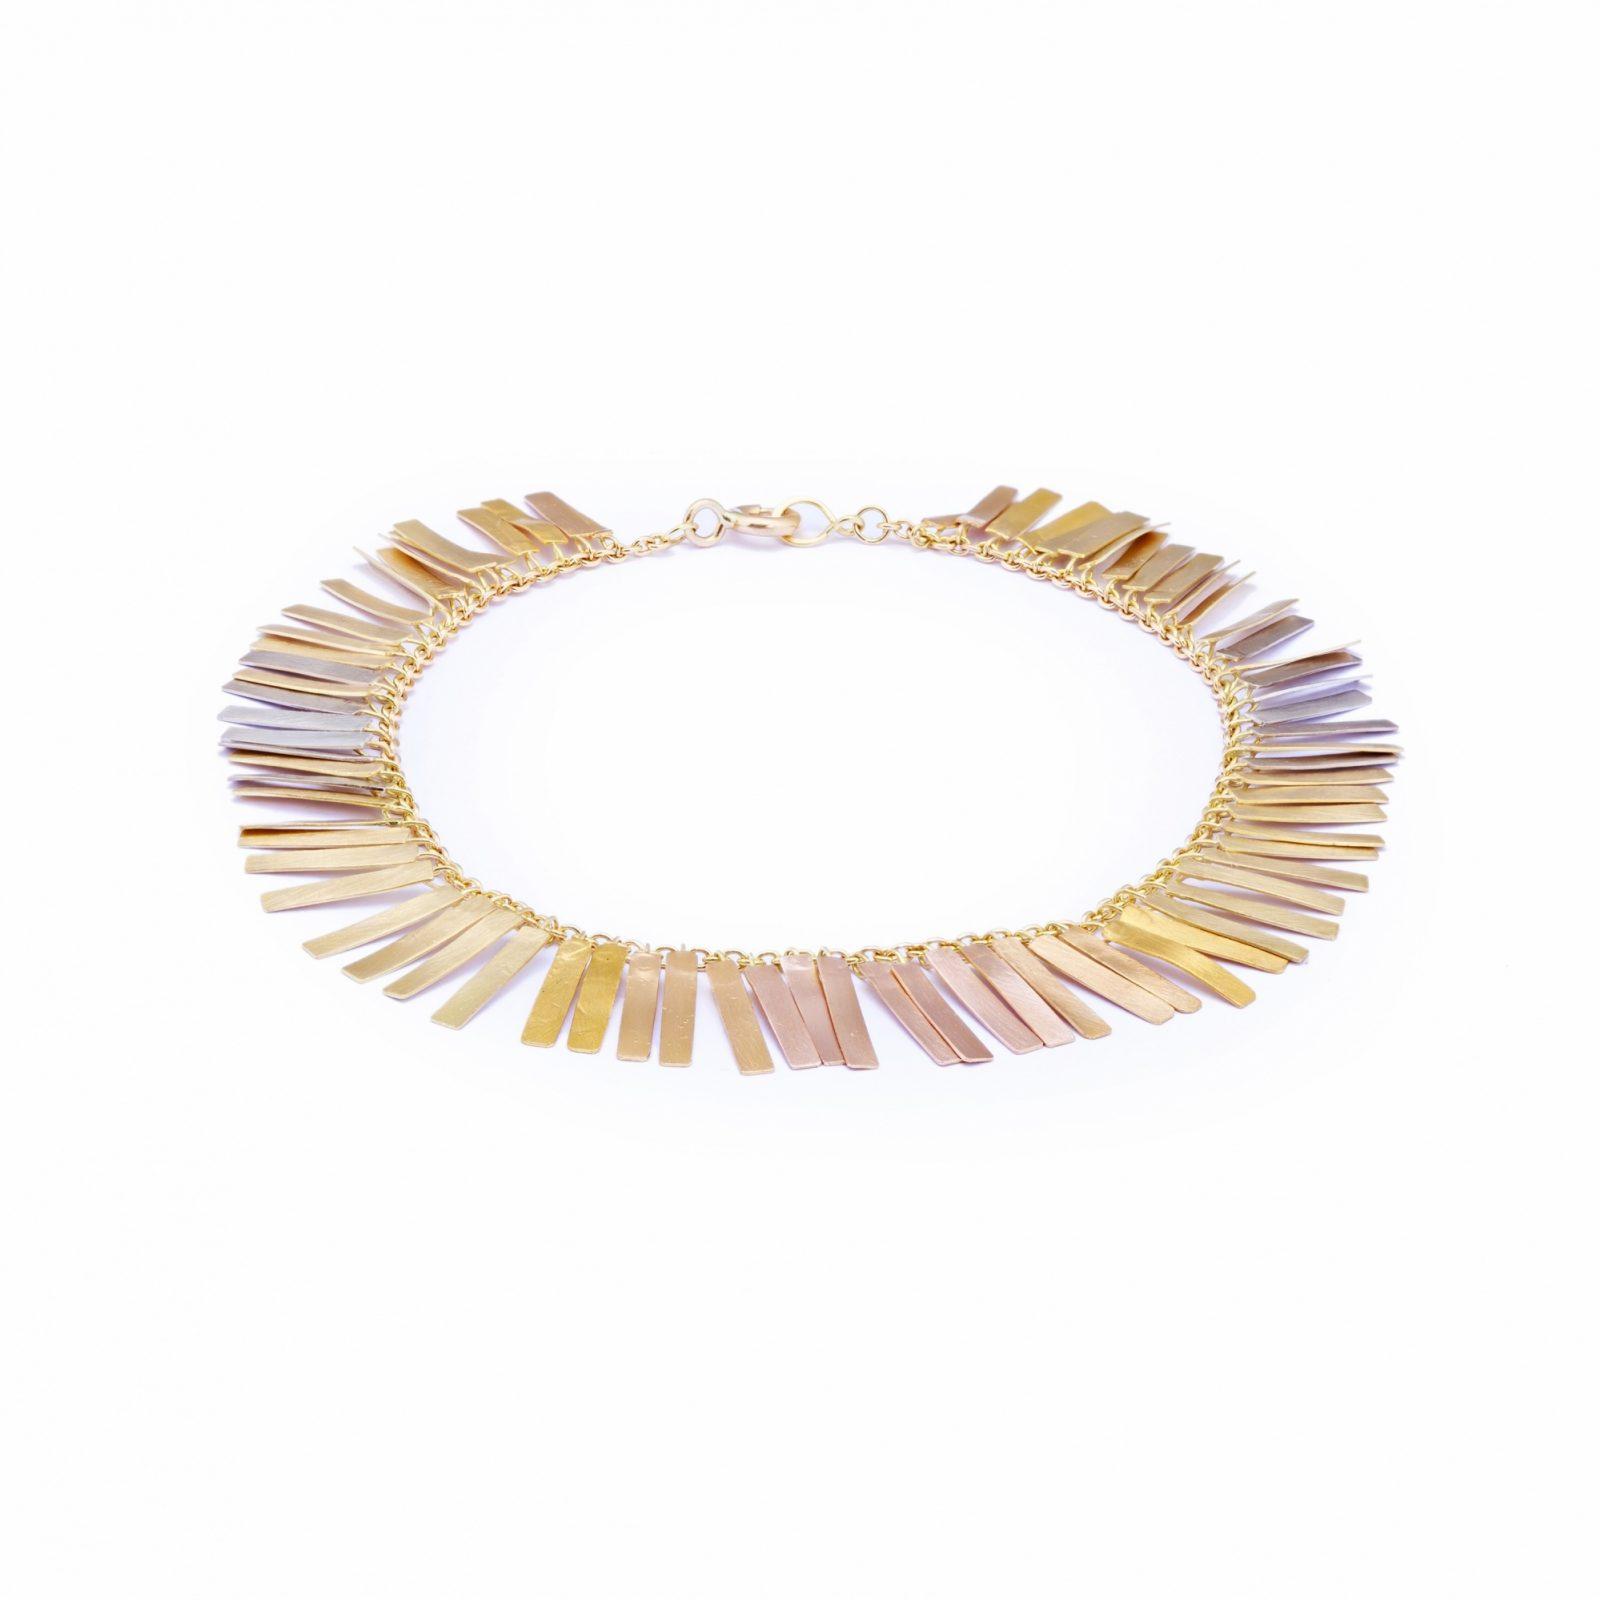 Sia Taylor KB1 RAIN Rainbow Gold Sunset Fringe Bracelet WB